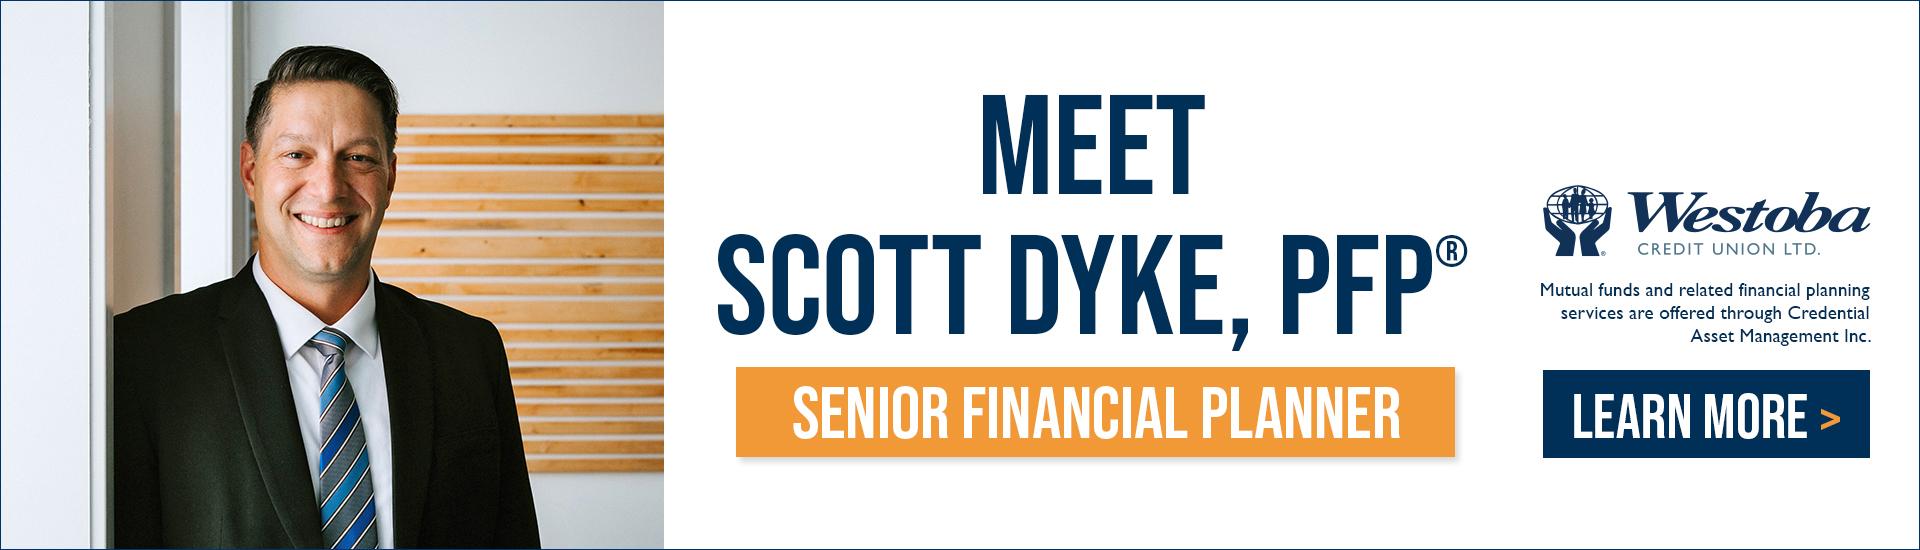 Scott Dyke, Westoba Senior Financial Planner